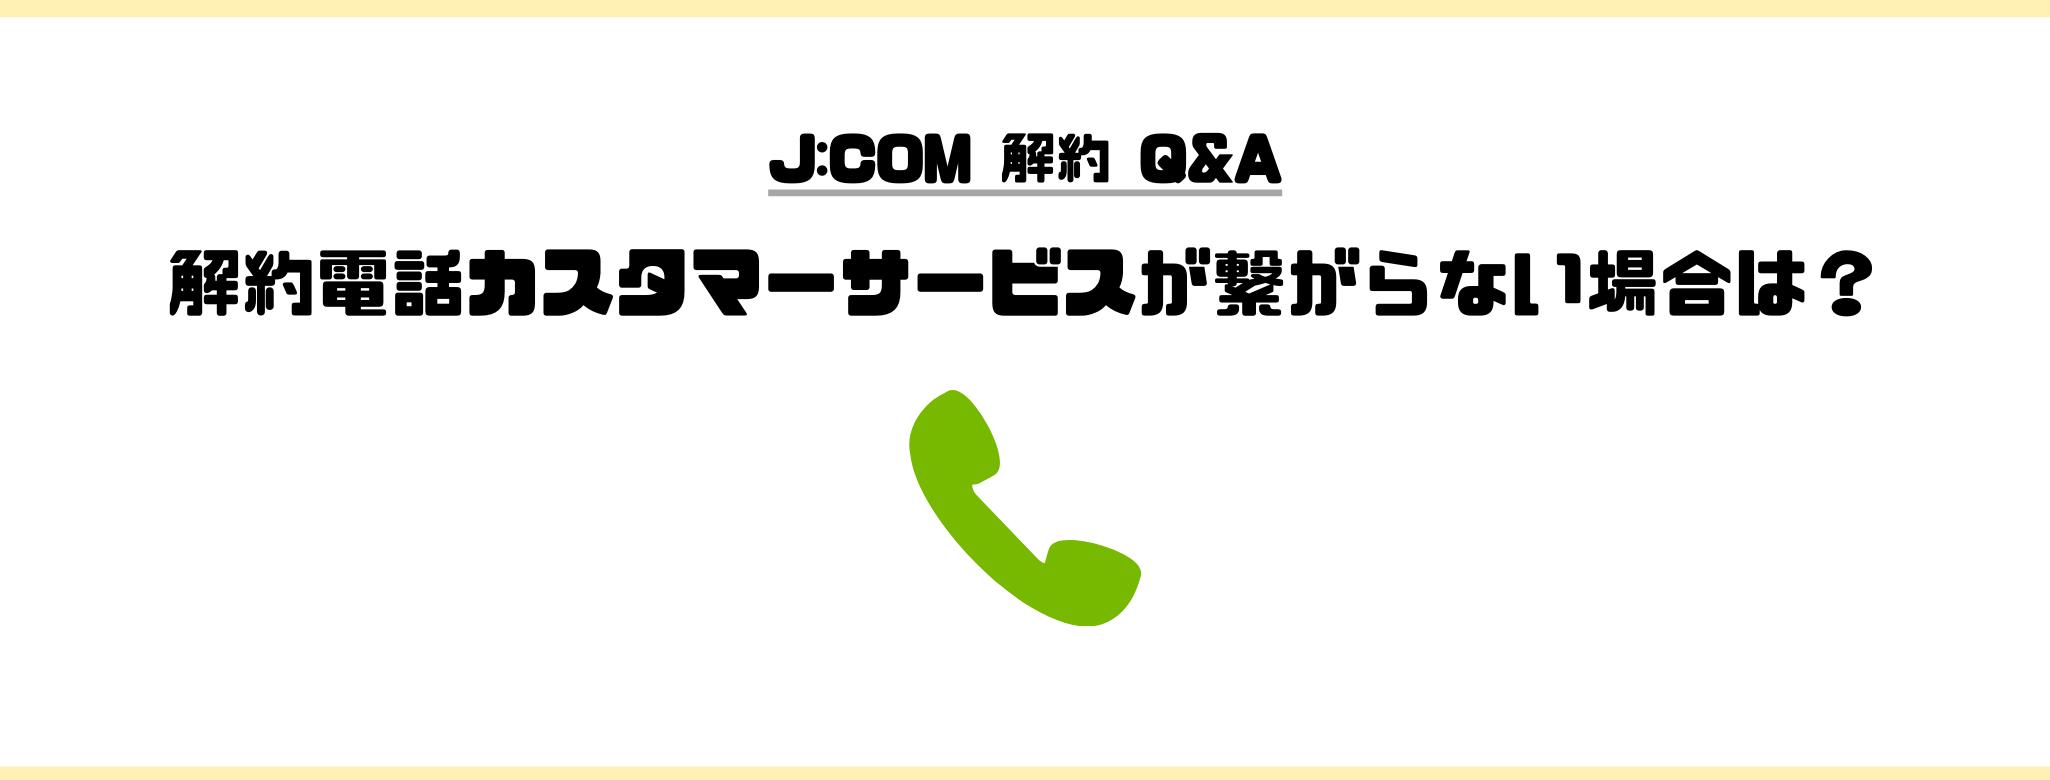 J:COM_解約_カスタマーサービス_電話_繋がらない